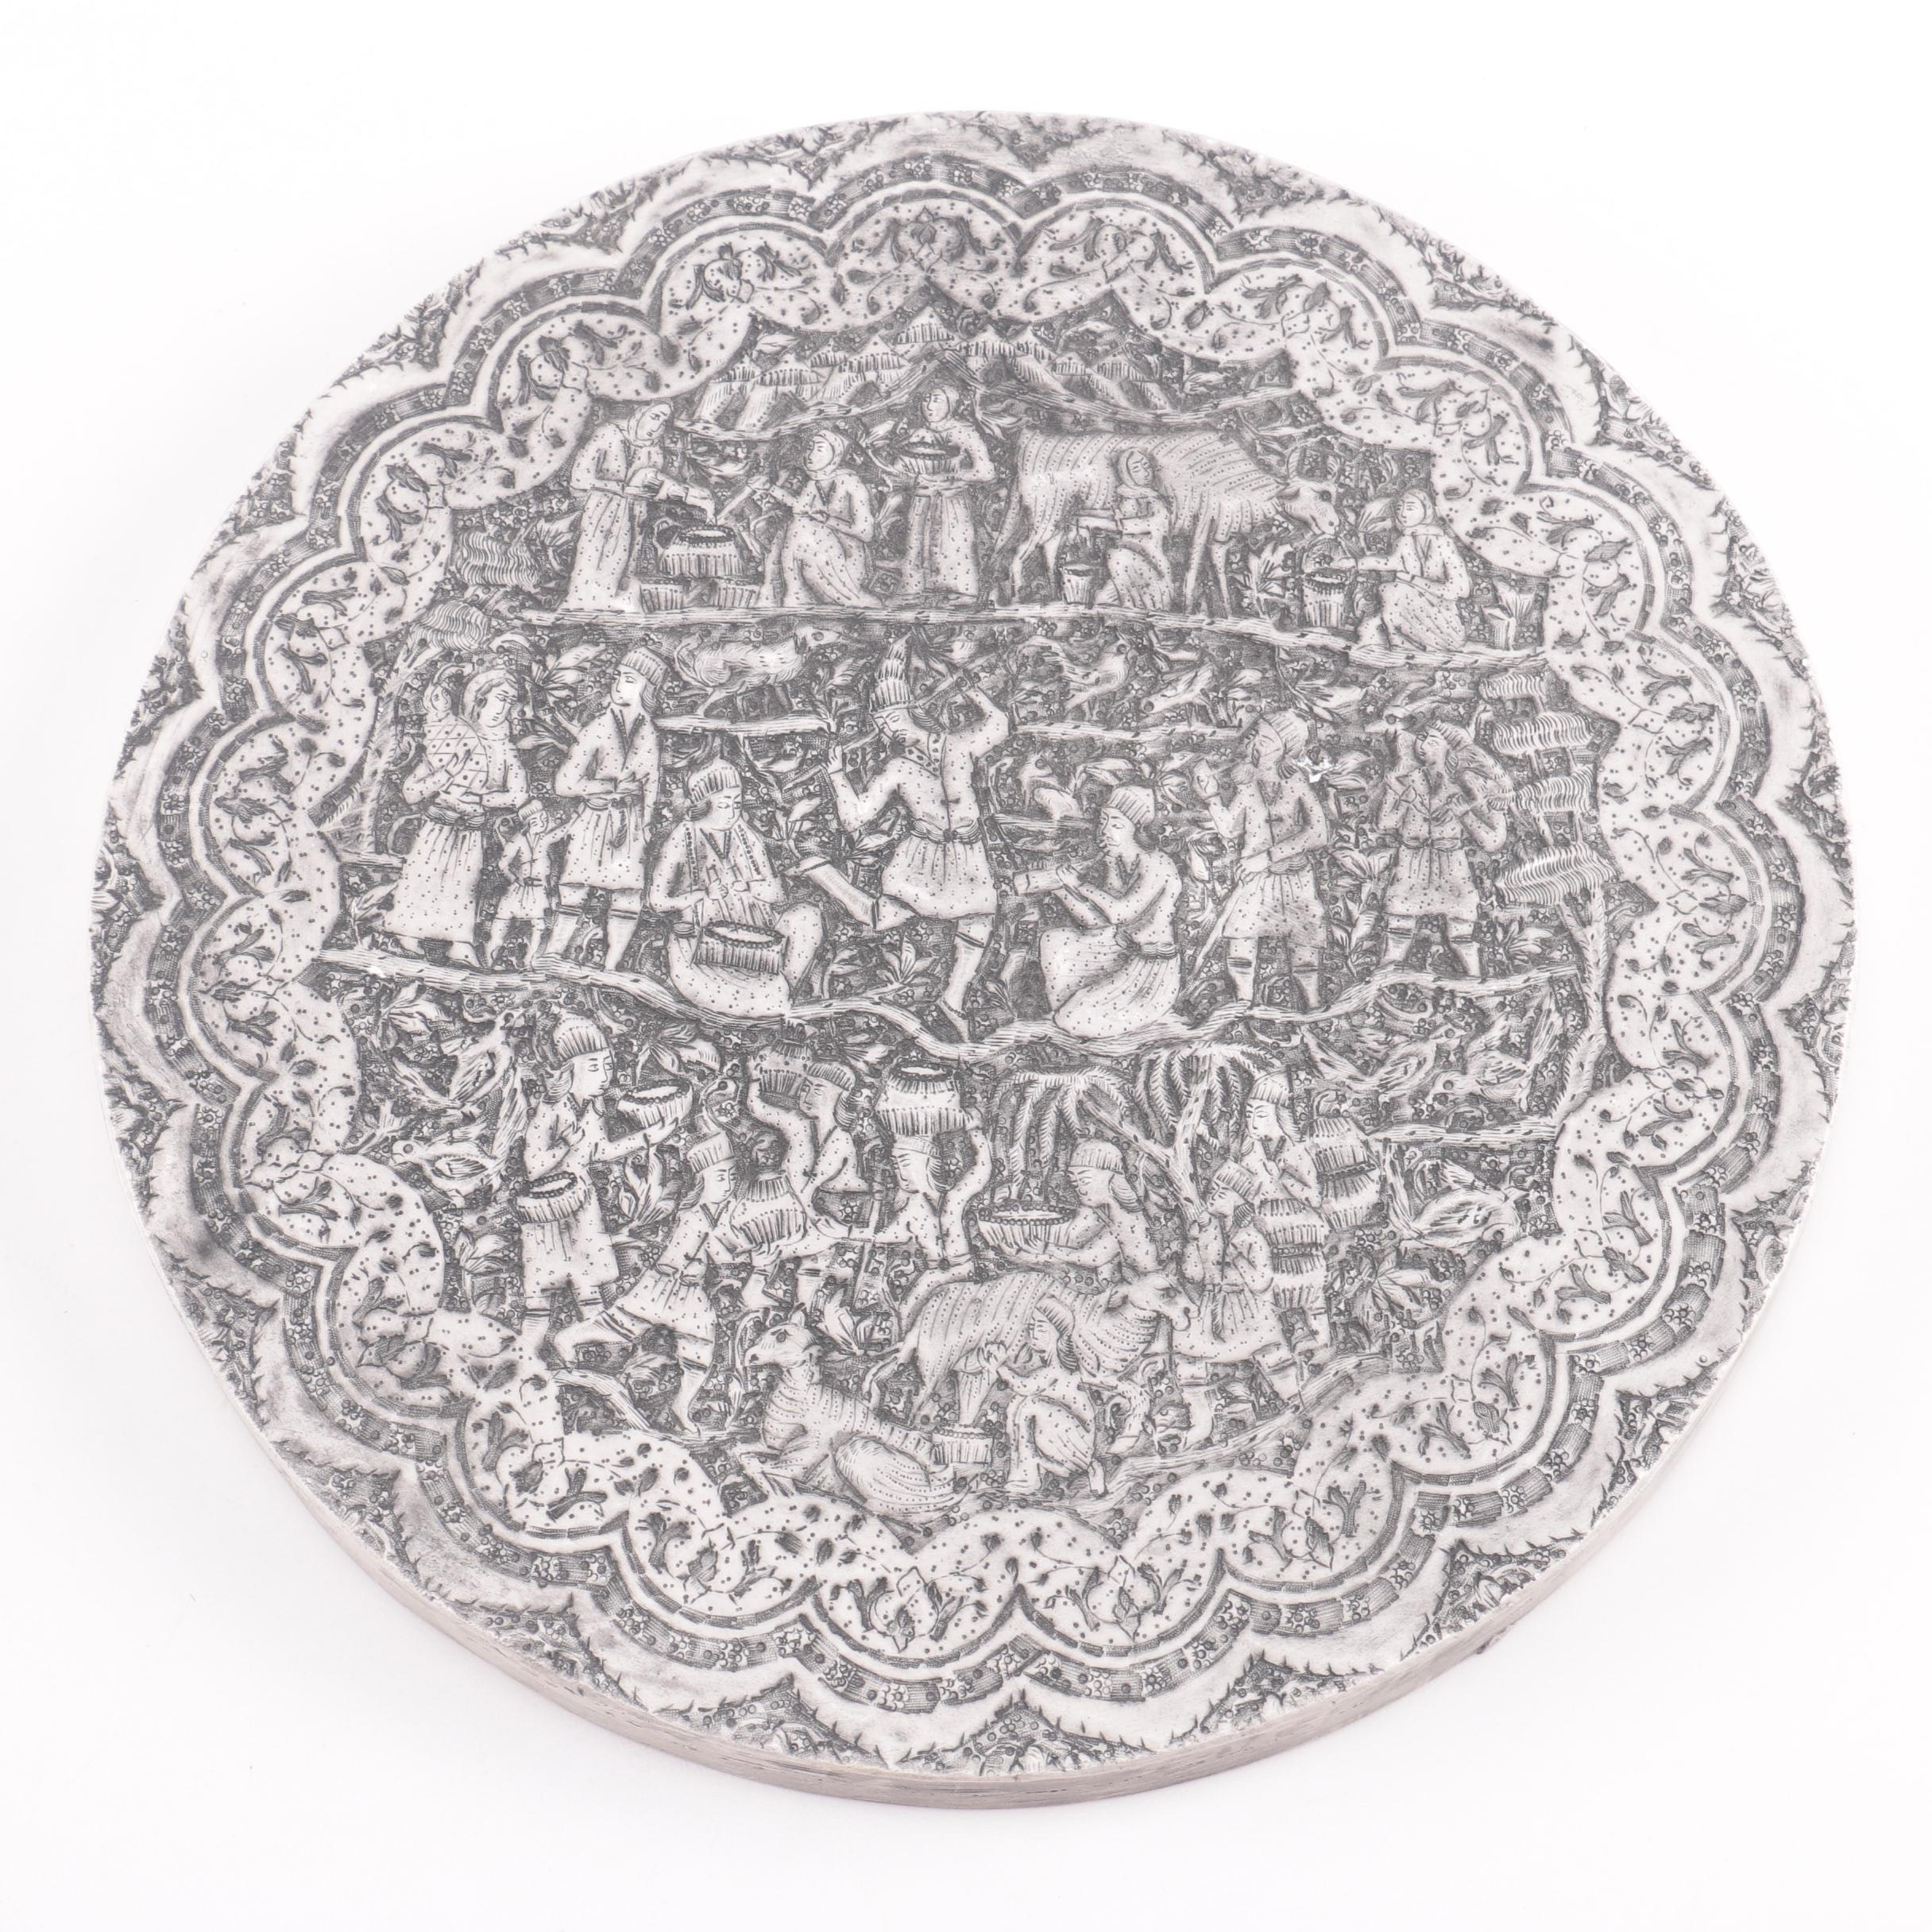 Decorative Round Plaster Persian Reproduction